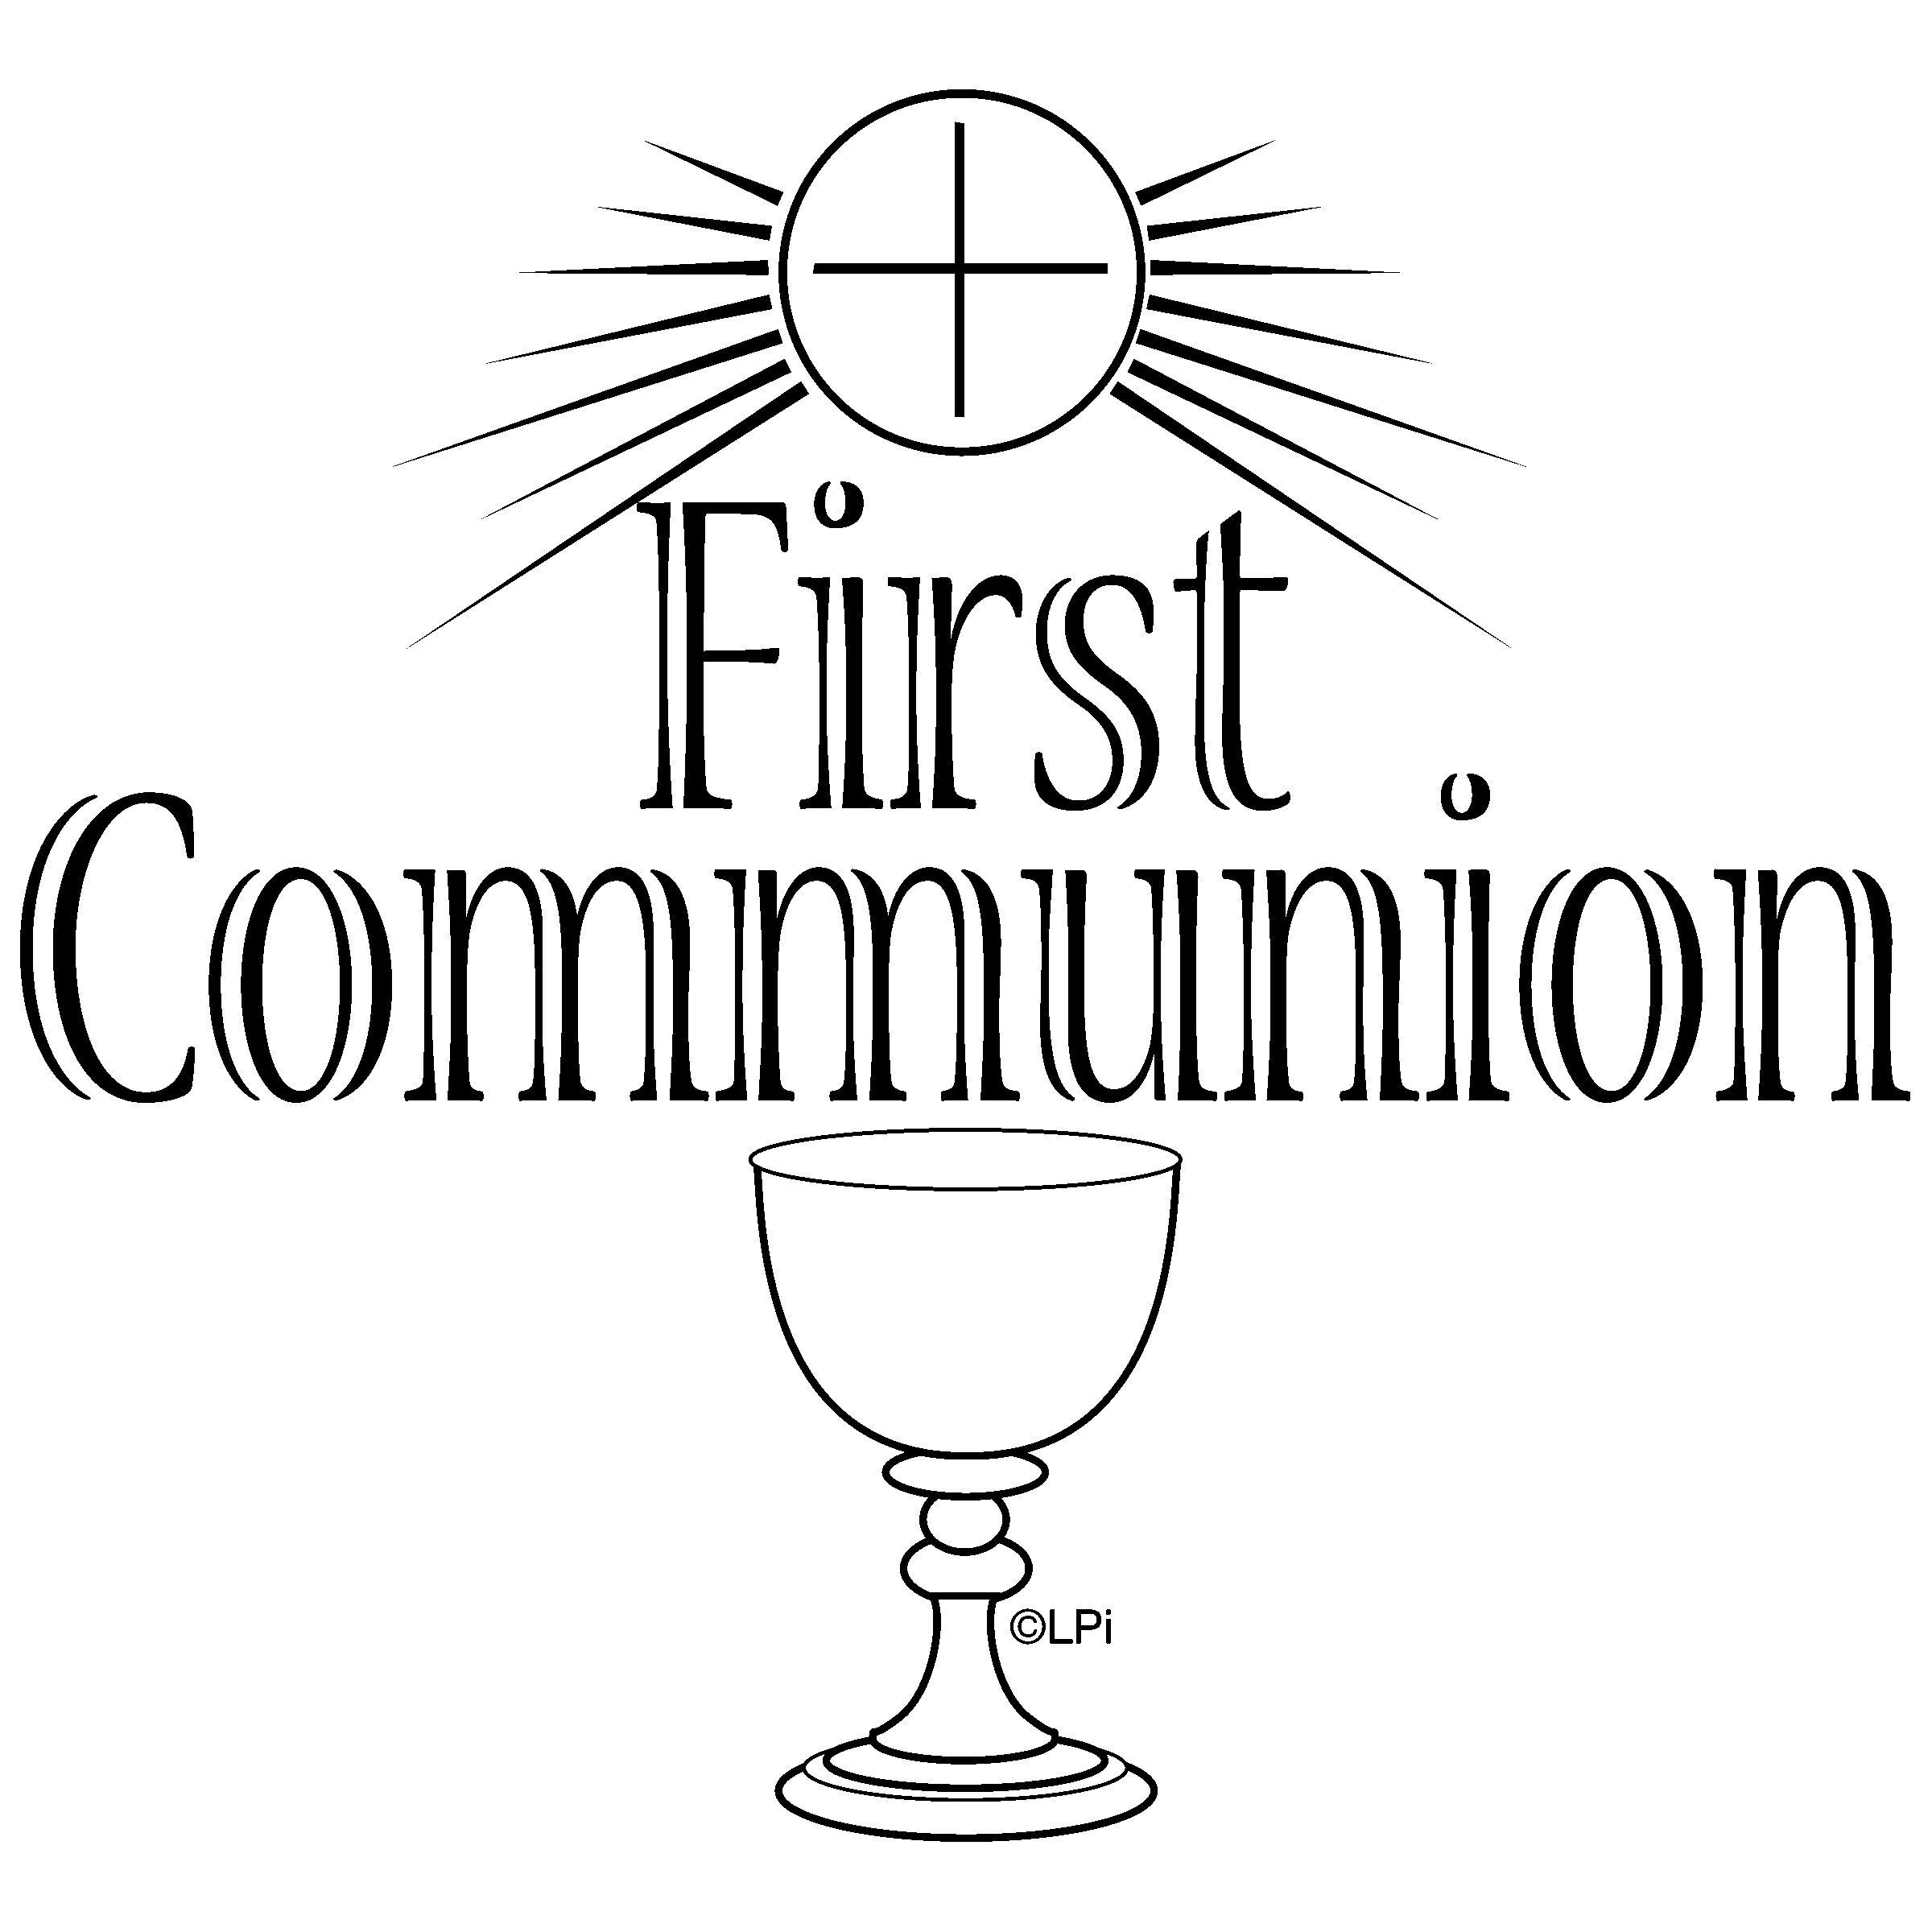 First Communion.JPG (2400×2400) | party ideas | Pinterest ...